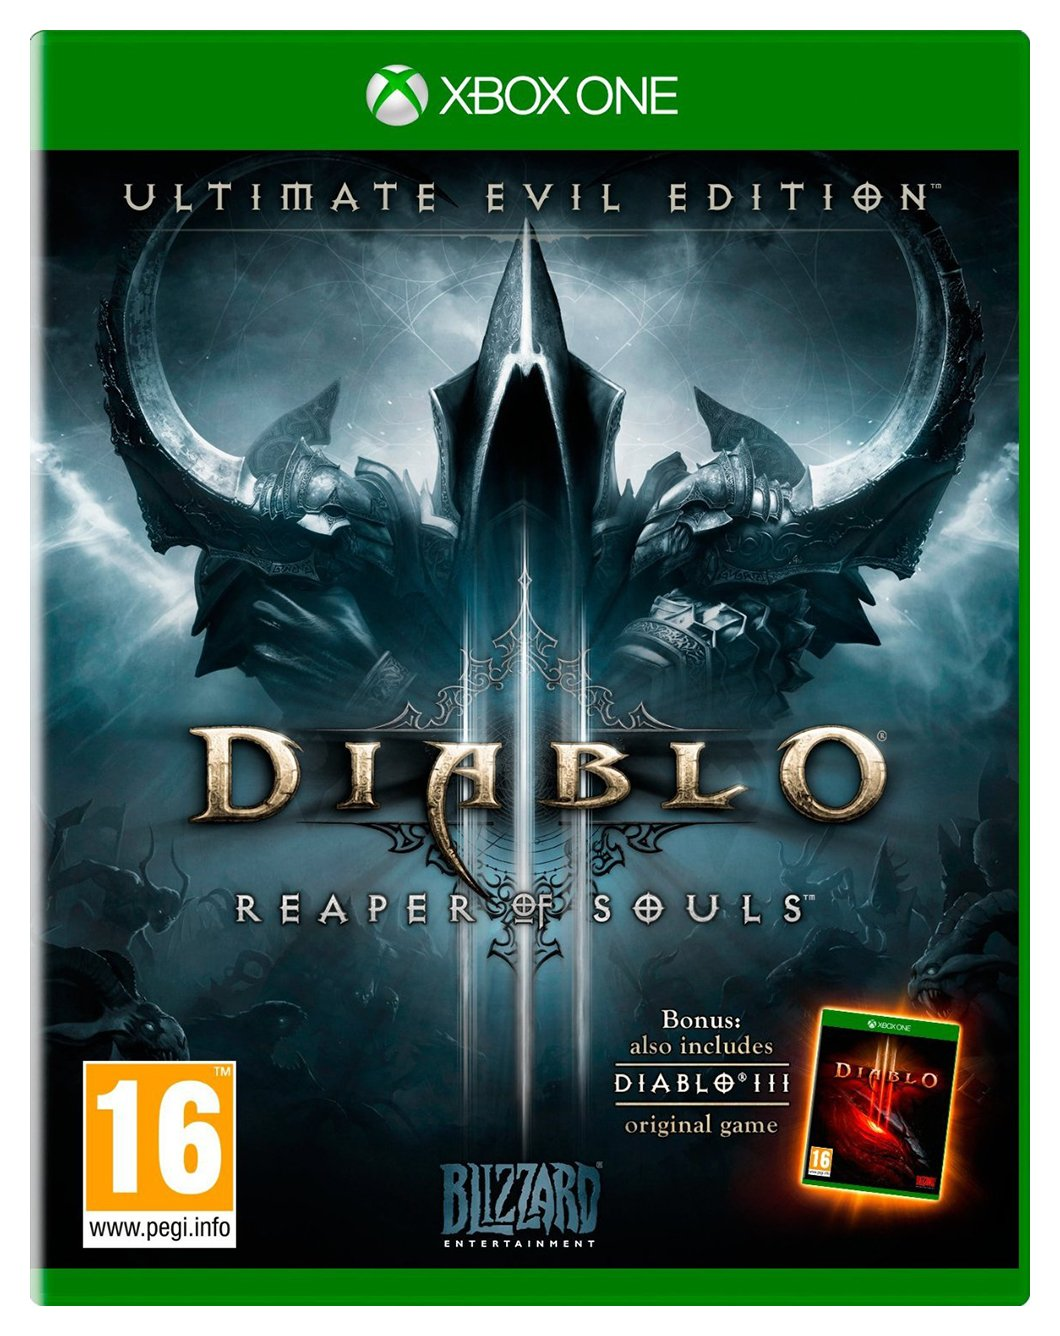 Image of Diablo 3 - Xbox - One Game.